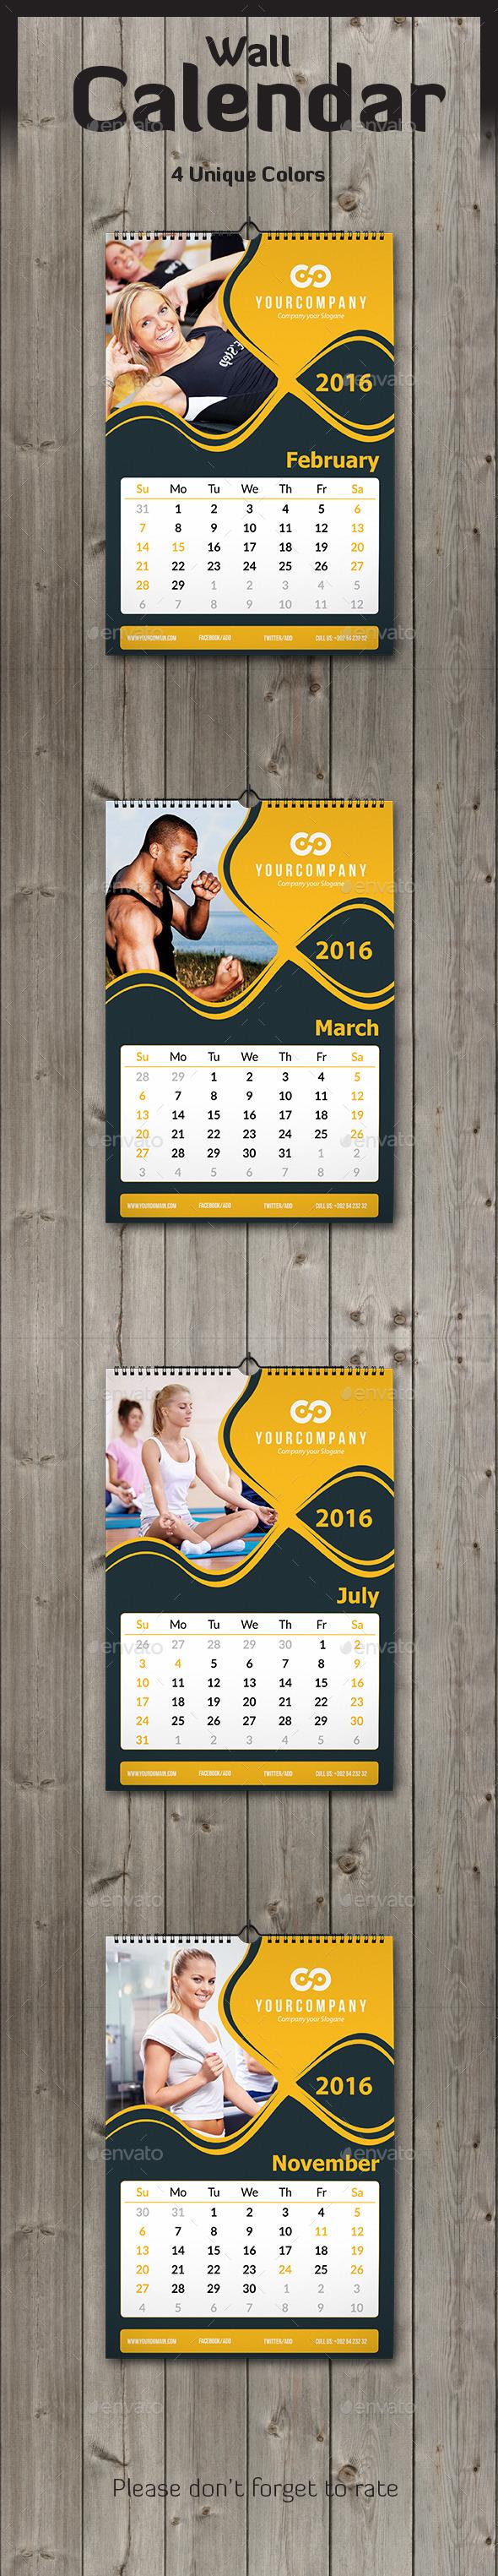 Wall Calendar 2016 - Calendars Stationery